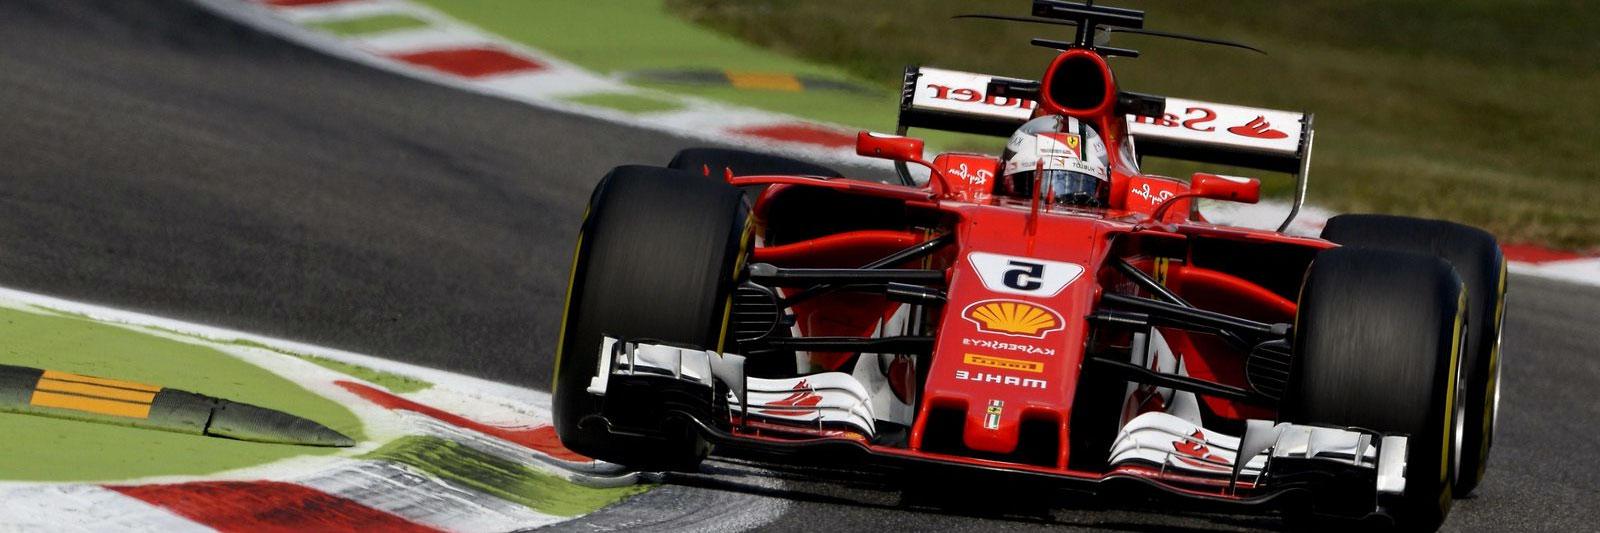 Italian Grand Prix with Grand Prix Tours